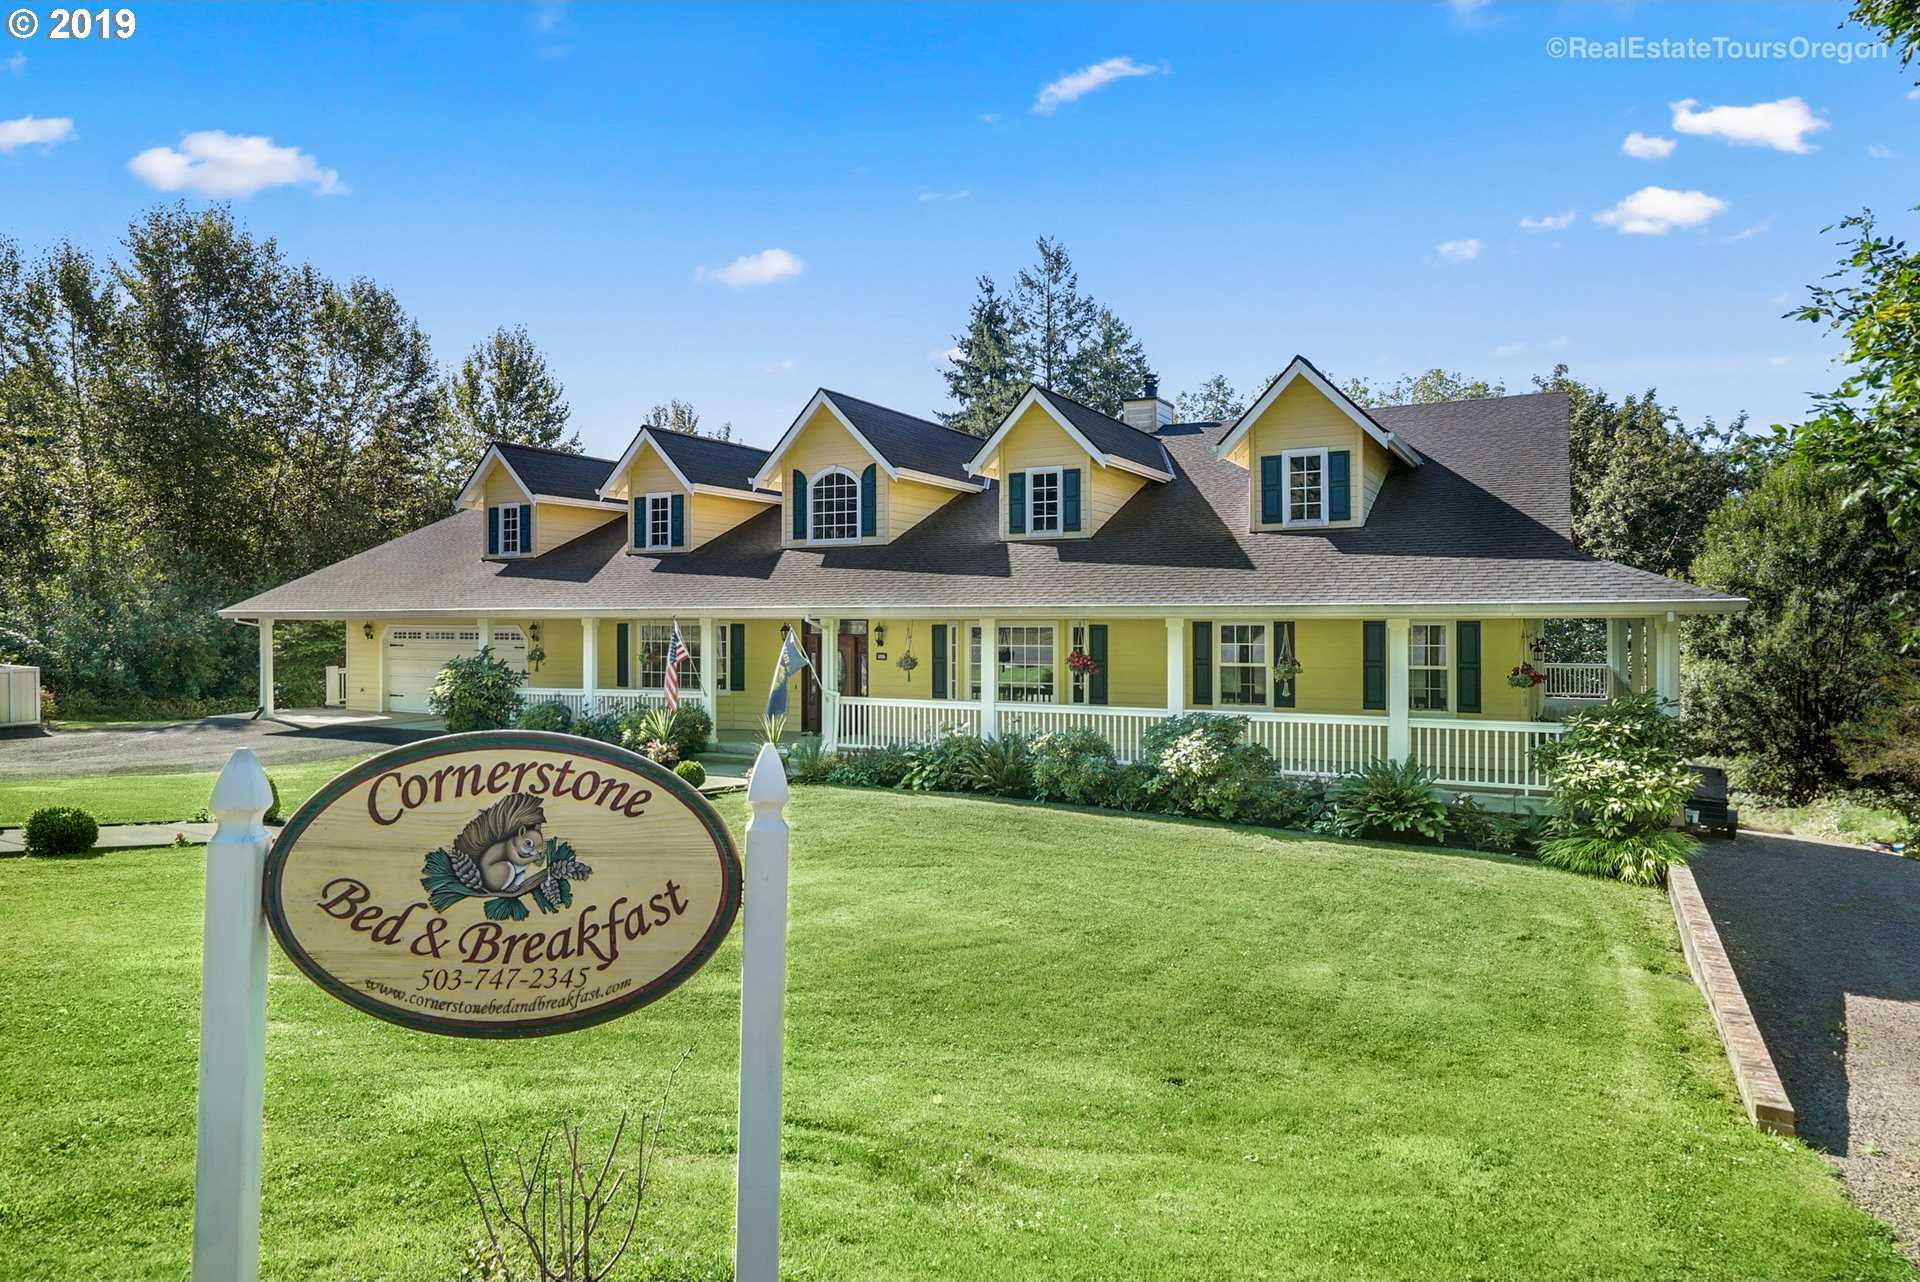 $1,399,900 - 5Br/6Ba -  for Sale in Beaverton